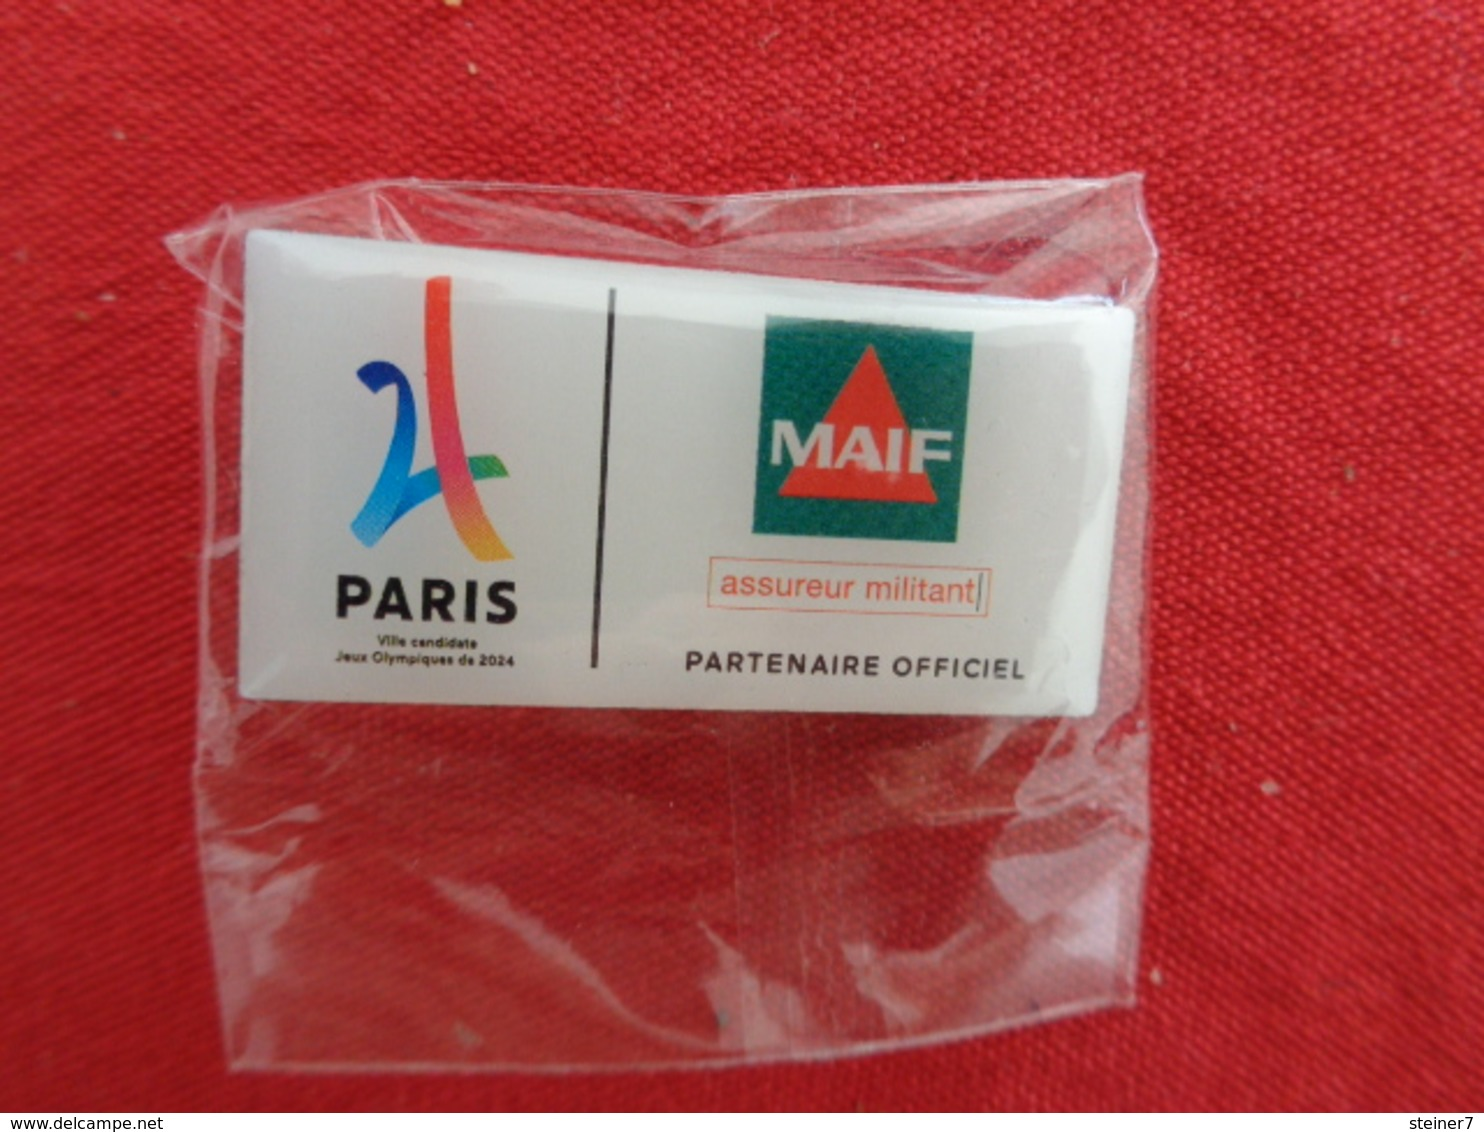 Pin's Paris MAIF Partenaire Officiel J O - Trademarks